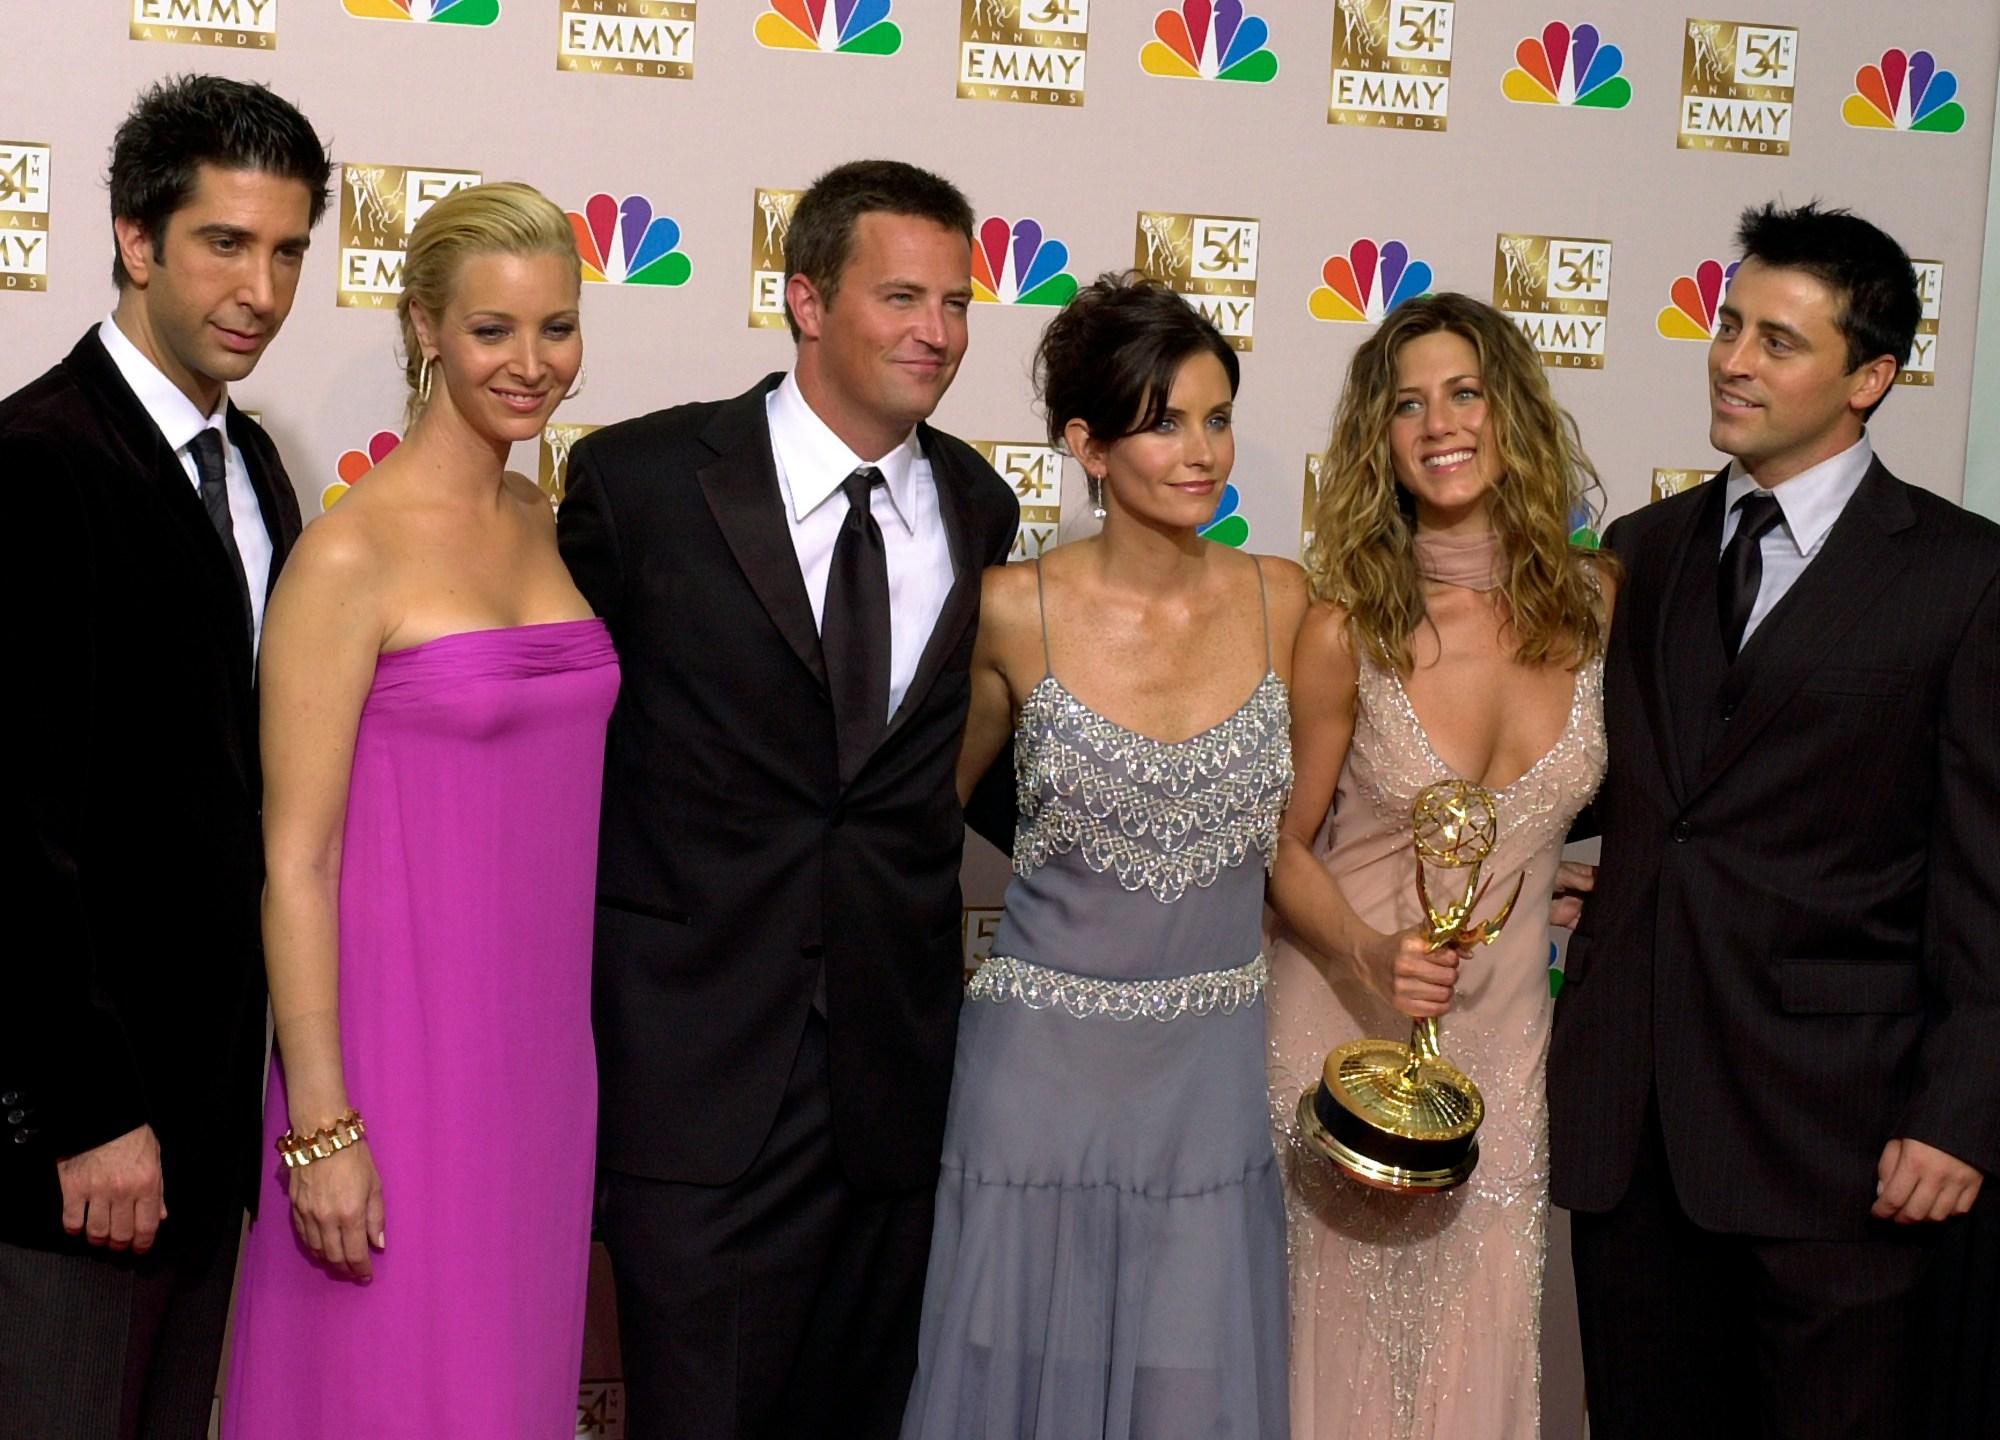 David Schwimmer, Lisa Kudrow, Matthew Perry, Courteney Cox, Jennifer Aniston, Matt LeBlanc